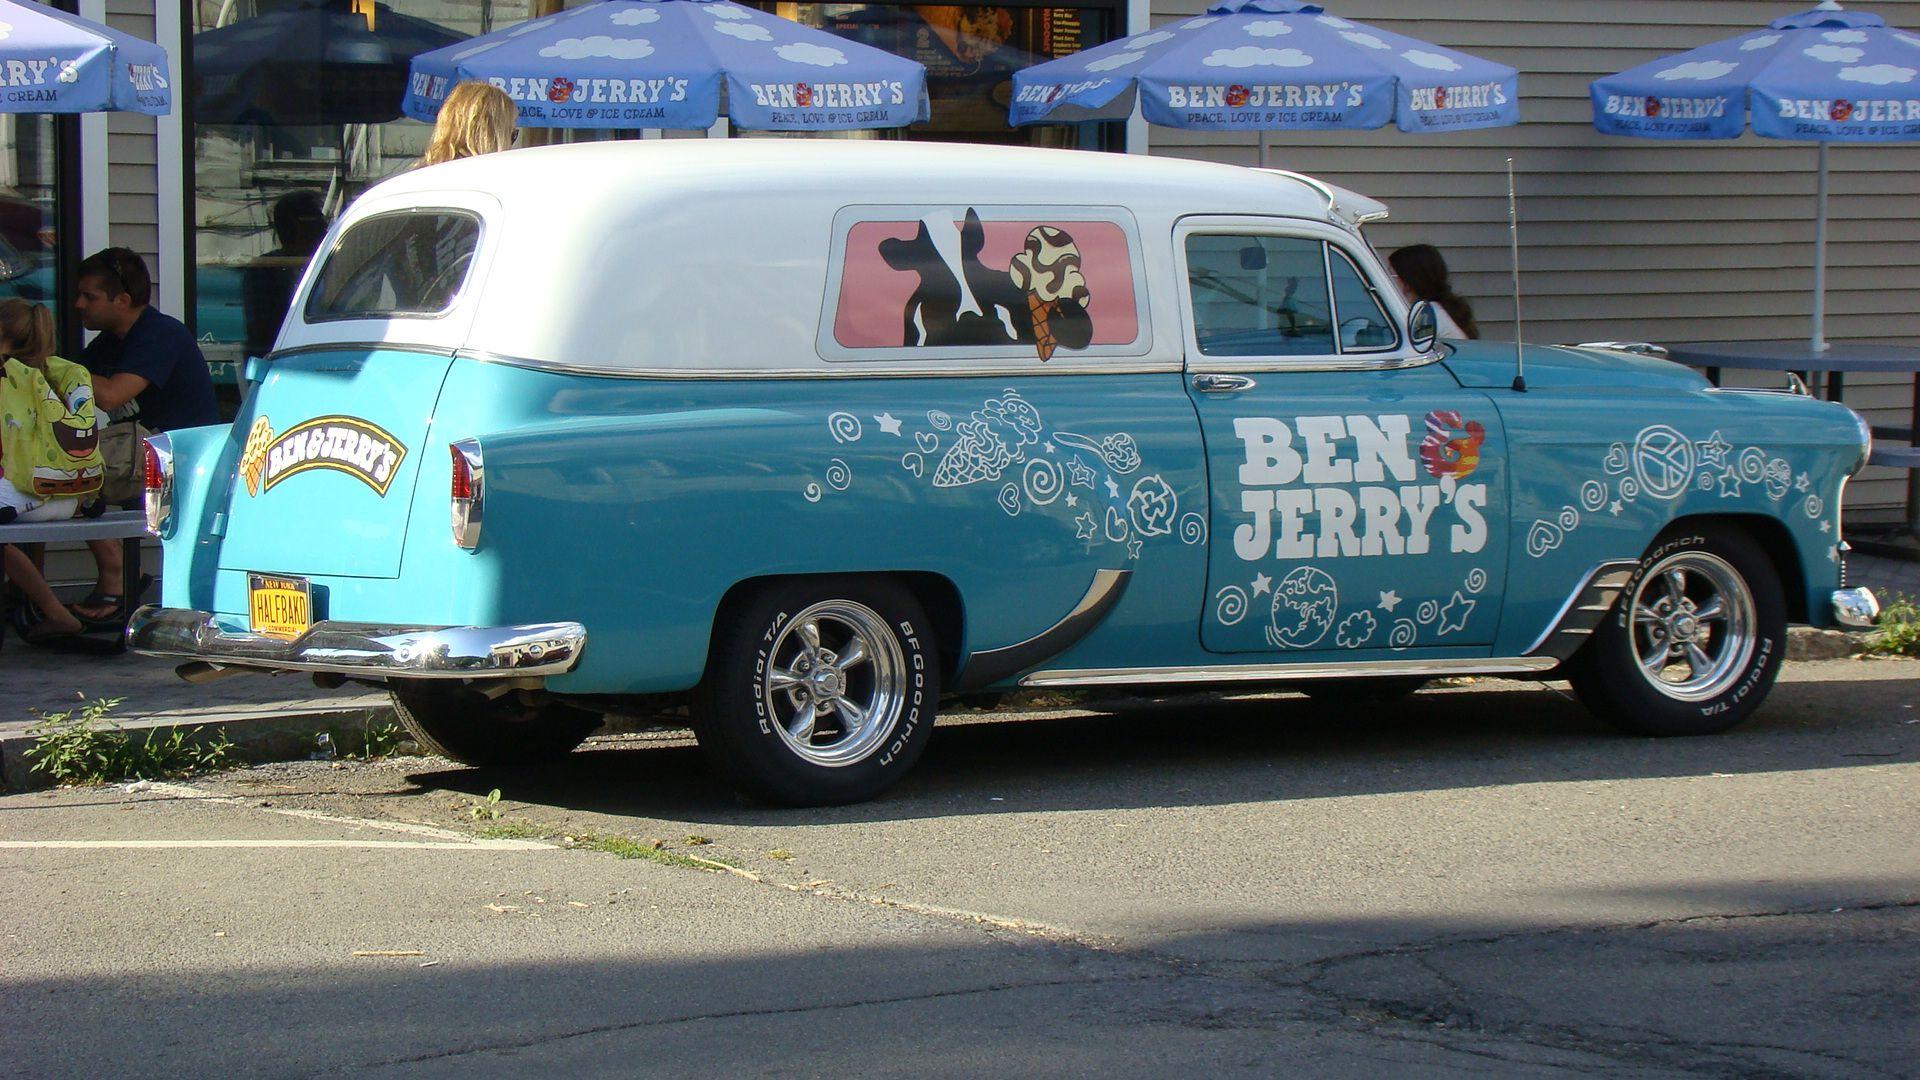 Ben & Jerry's car outside their shop in Watkins Glen, NY.